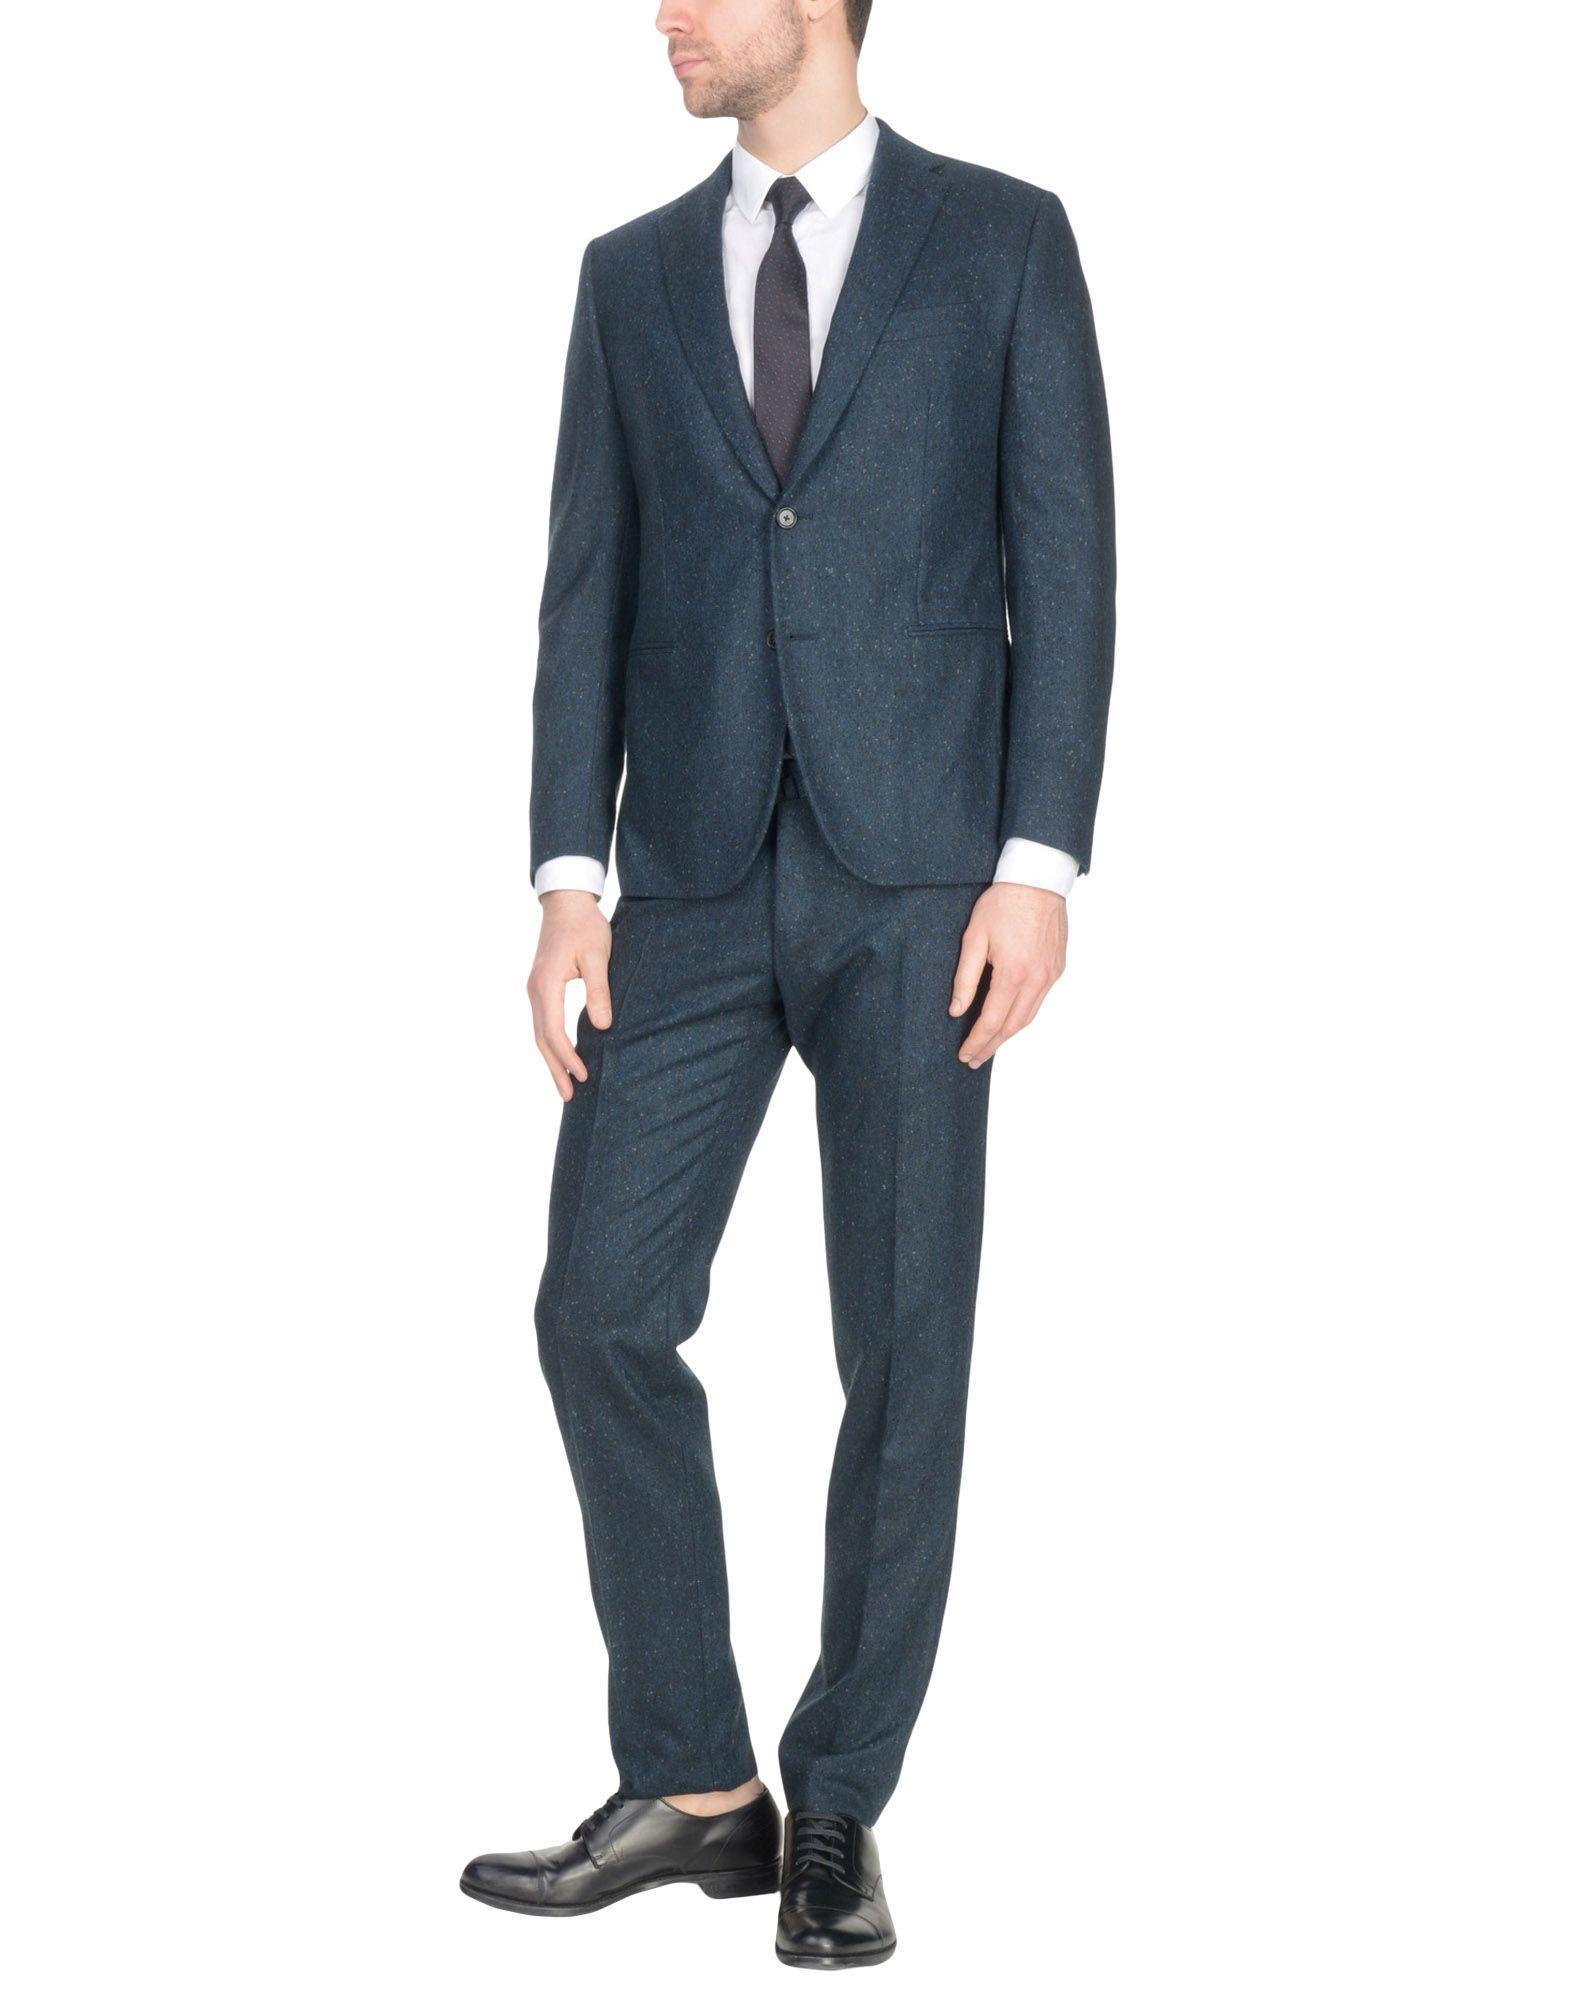 Caruso Suits In Dark Blue